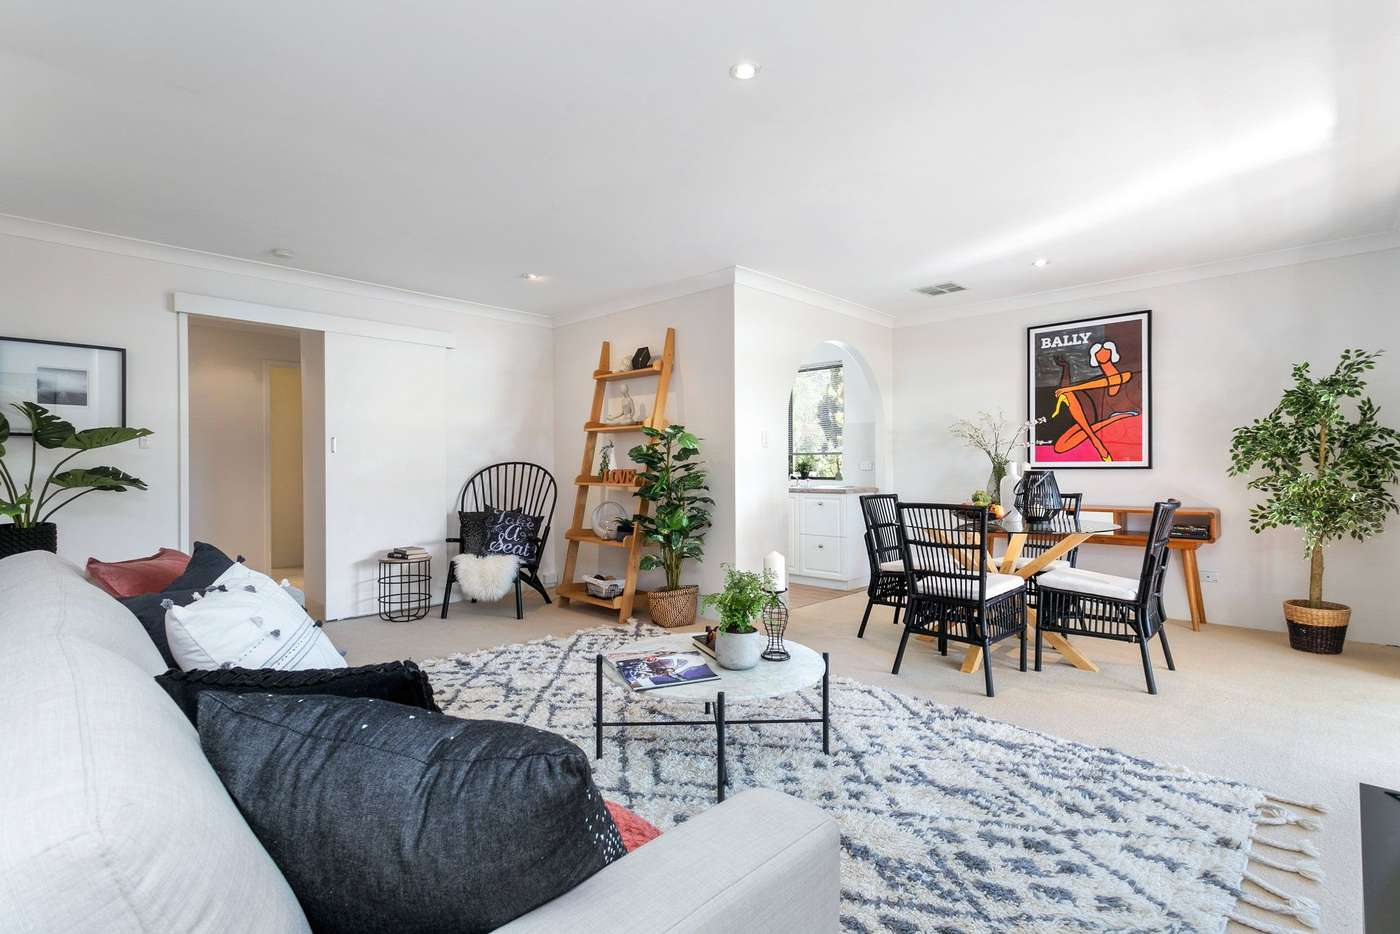 Main view of Homely apartment listing, 15/48 Austin Street, Shenton Park WA 6008